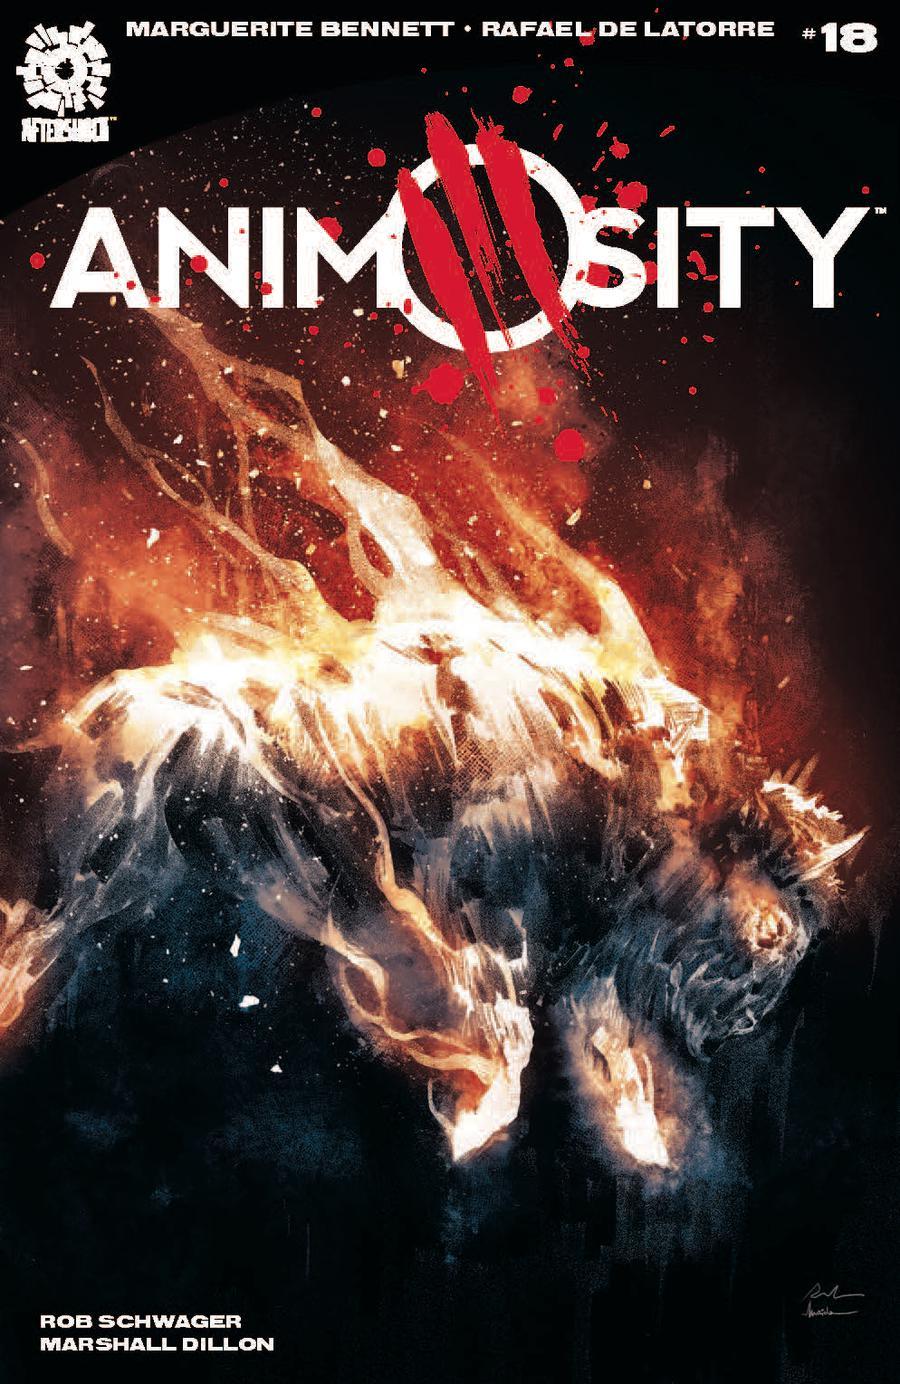 Animosity #18